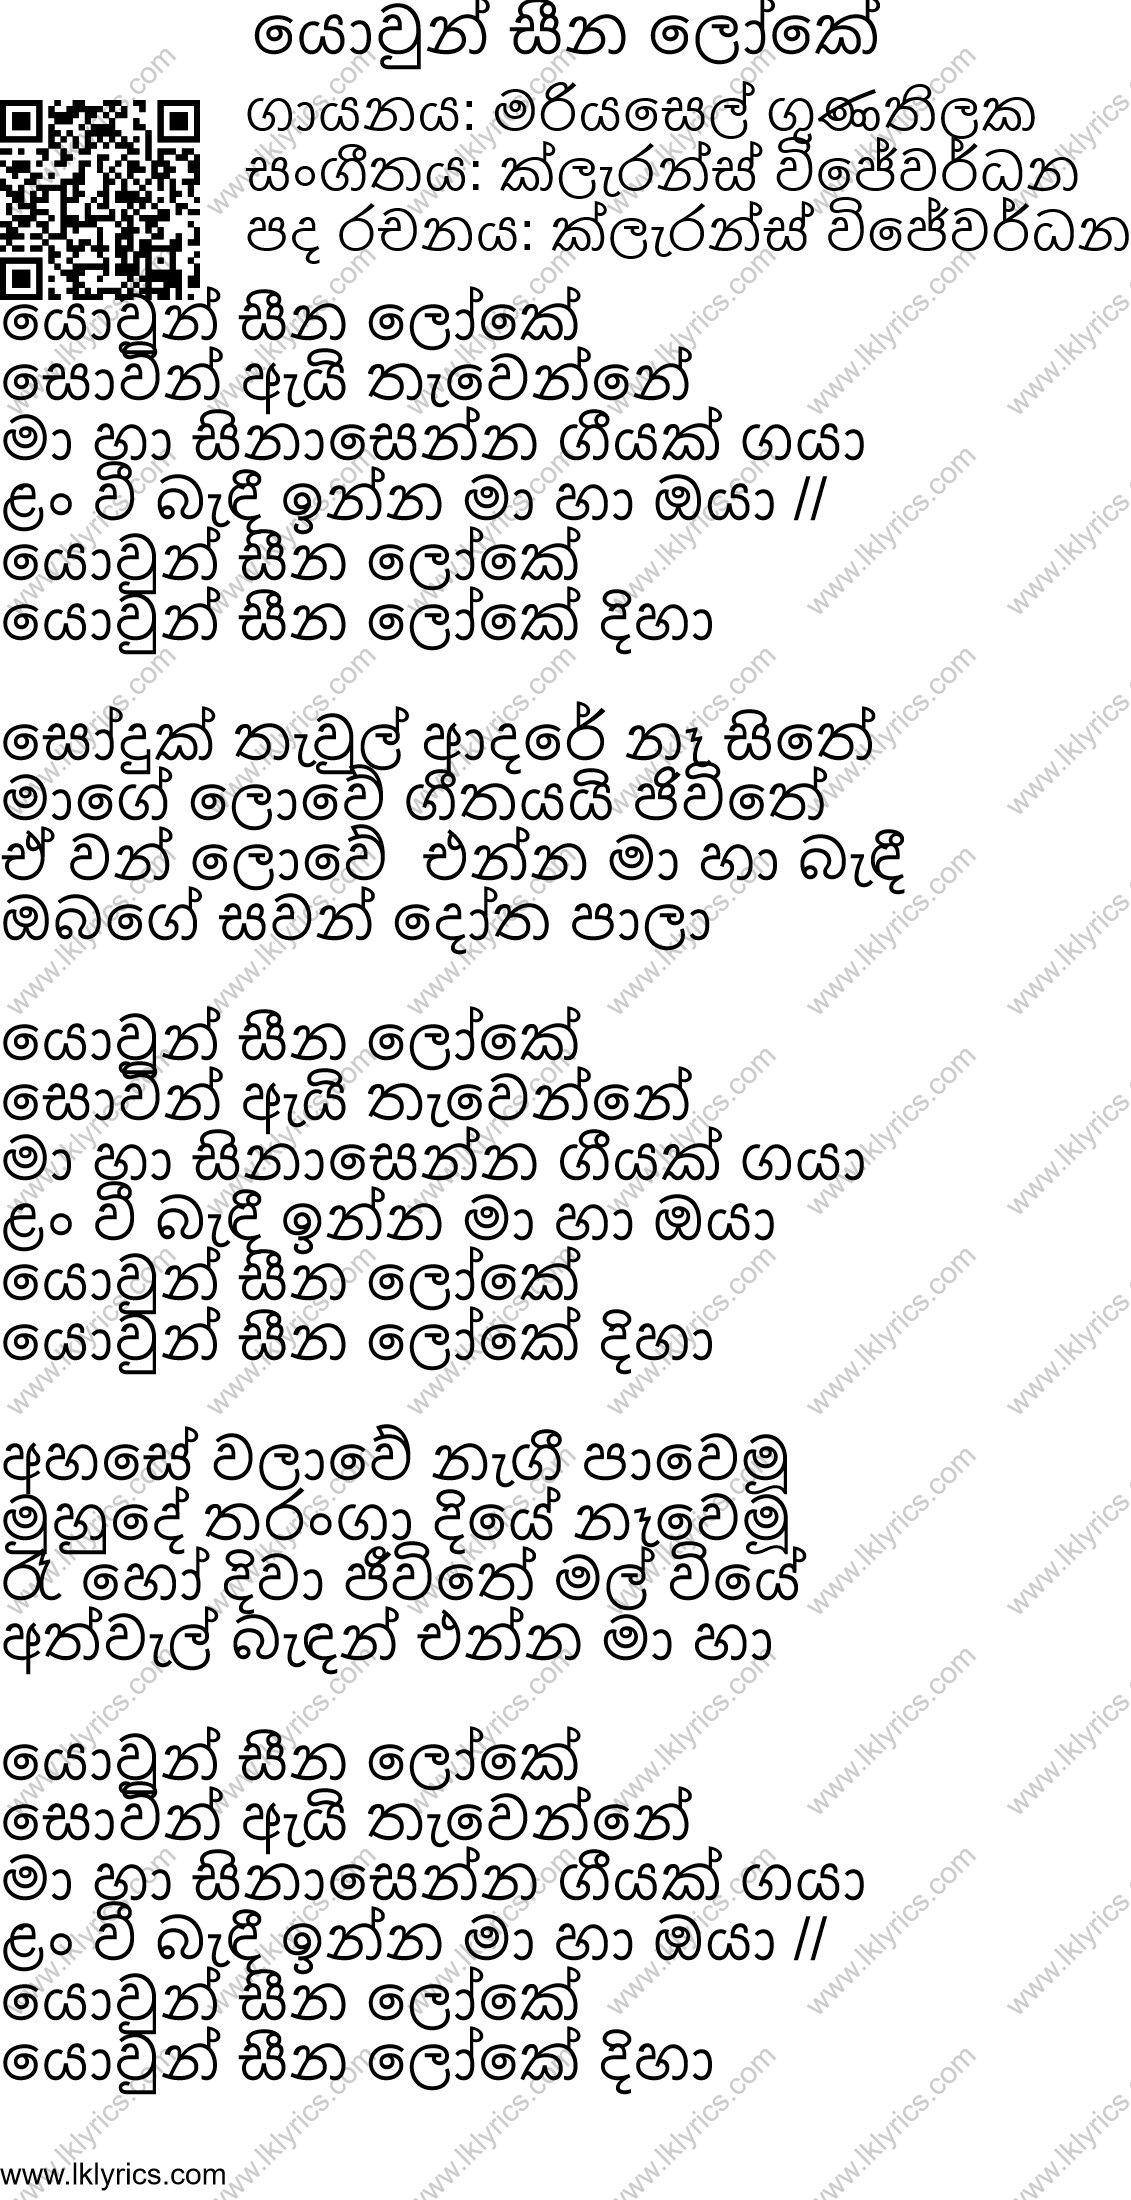 Pin By Sandali Hansani On Song Lyrics Best Song Lyrics Song Lyrics Best Songs